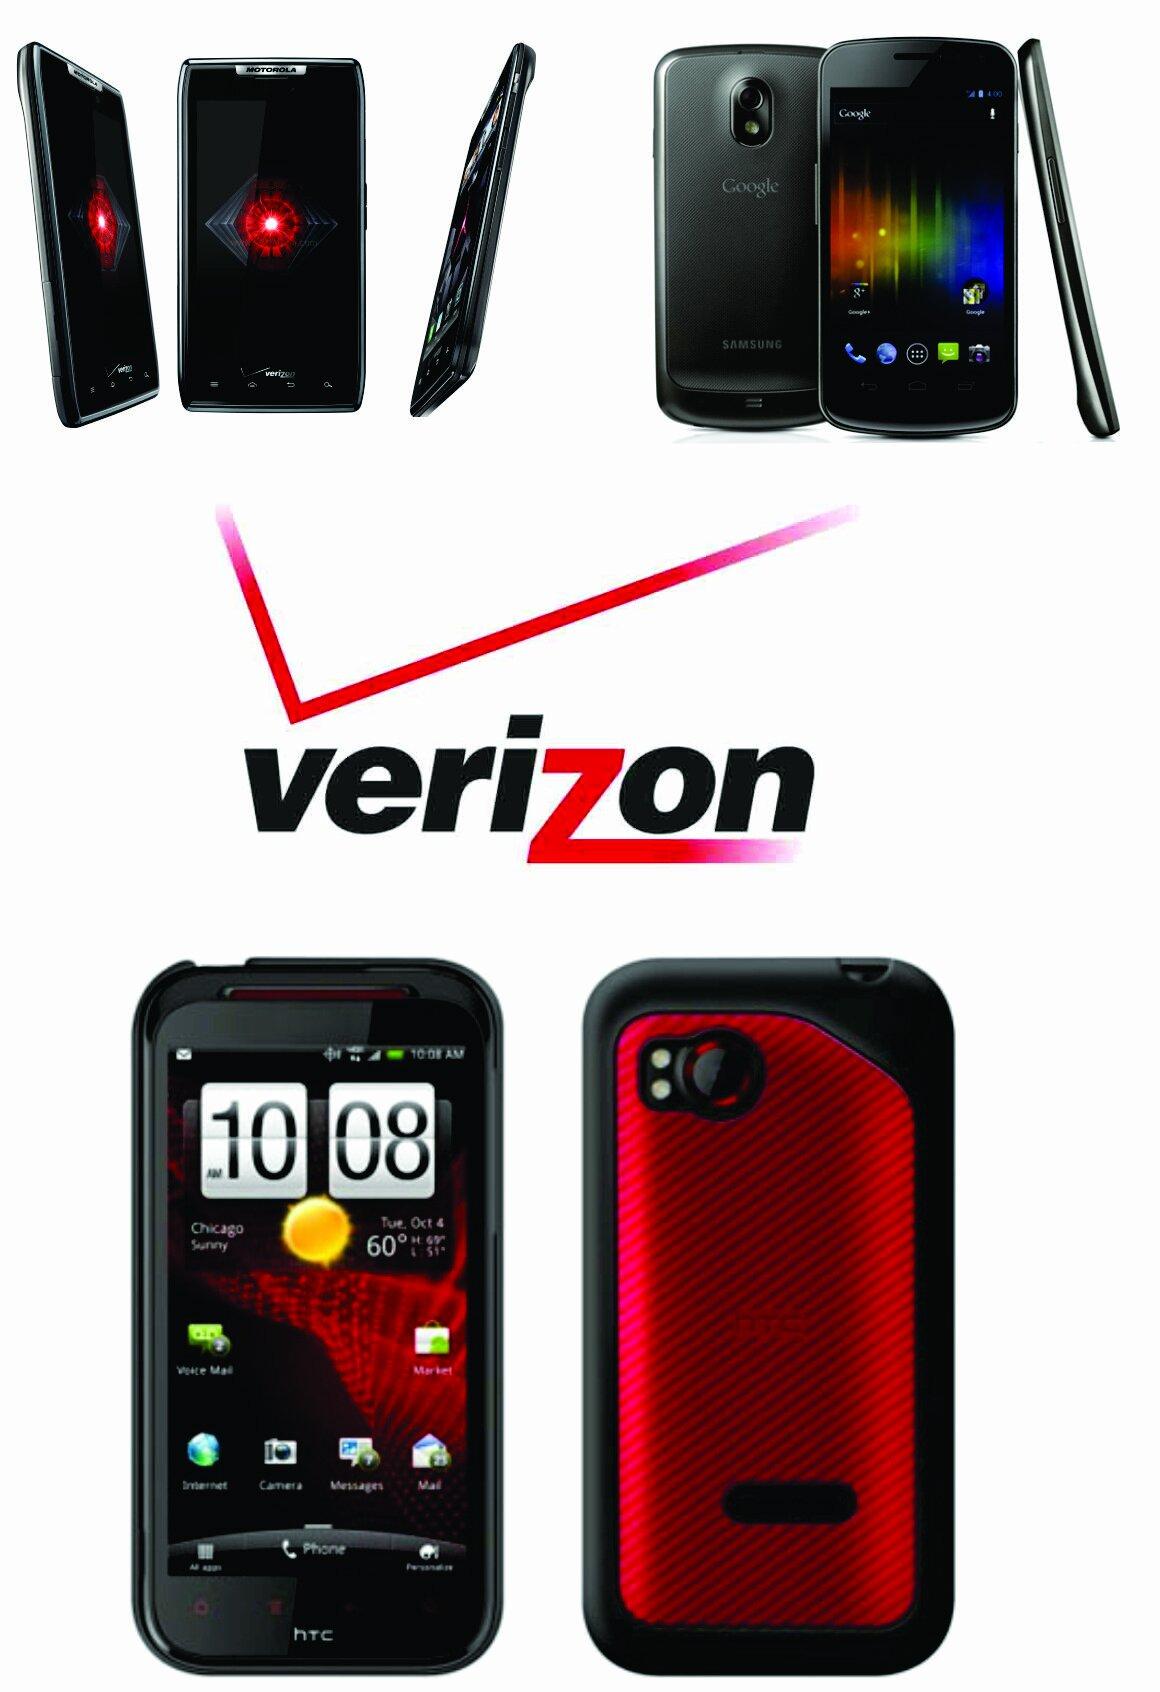 Verizon lineup